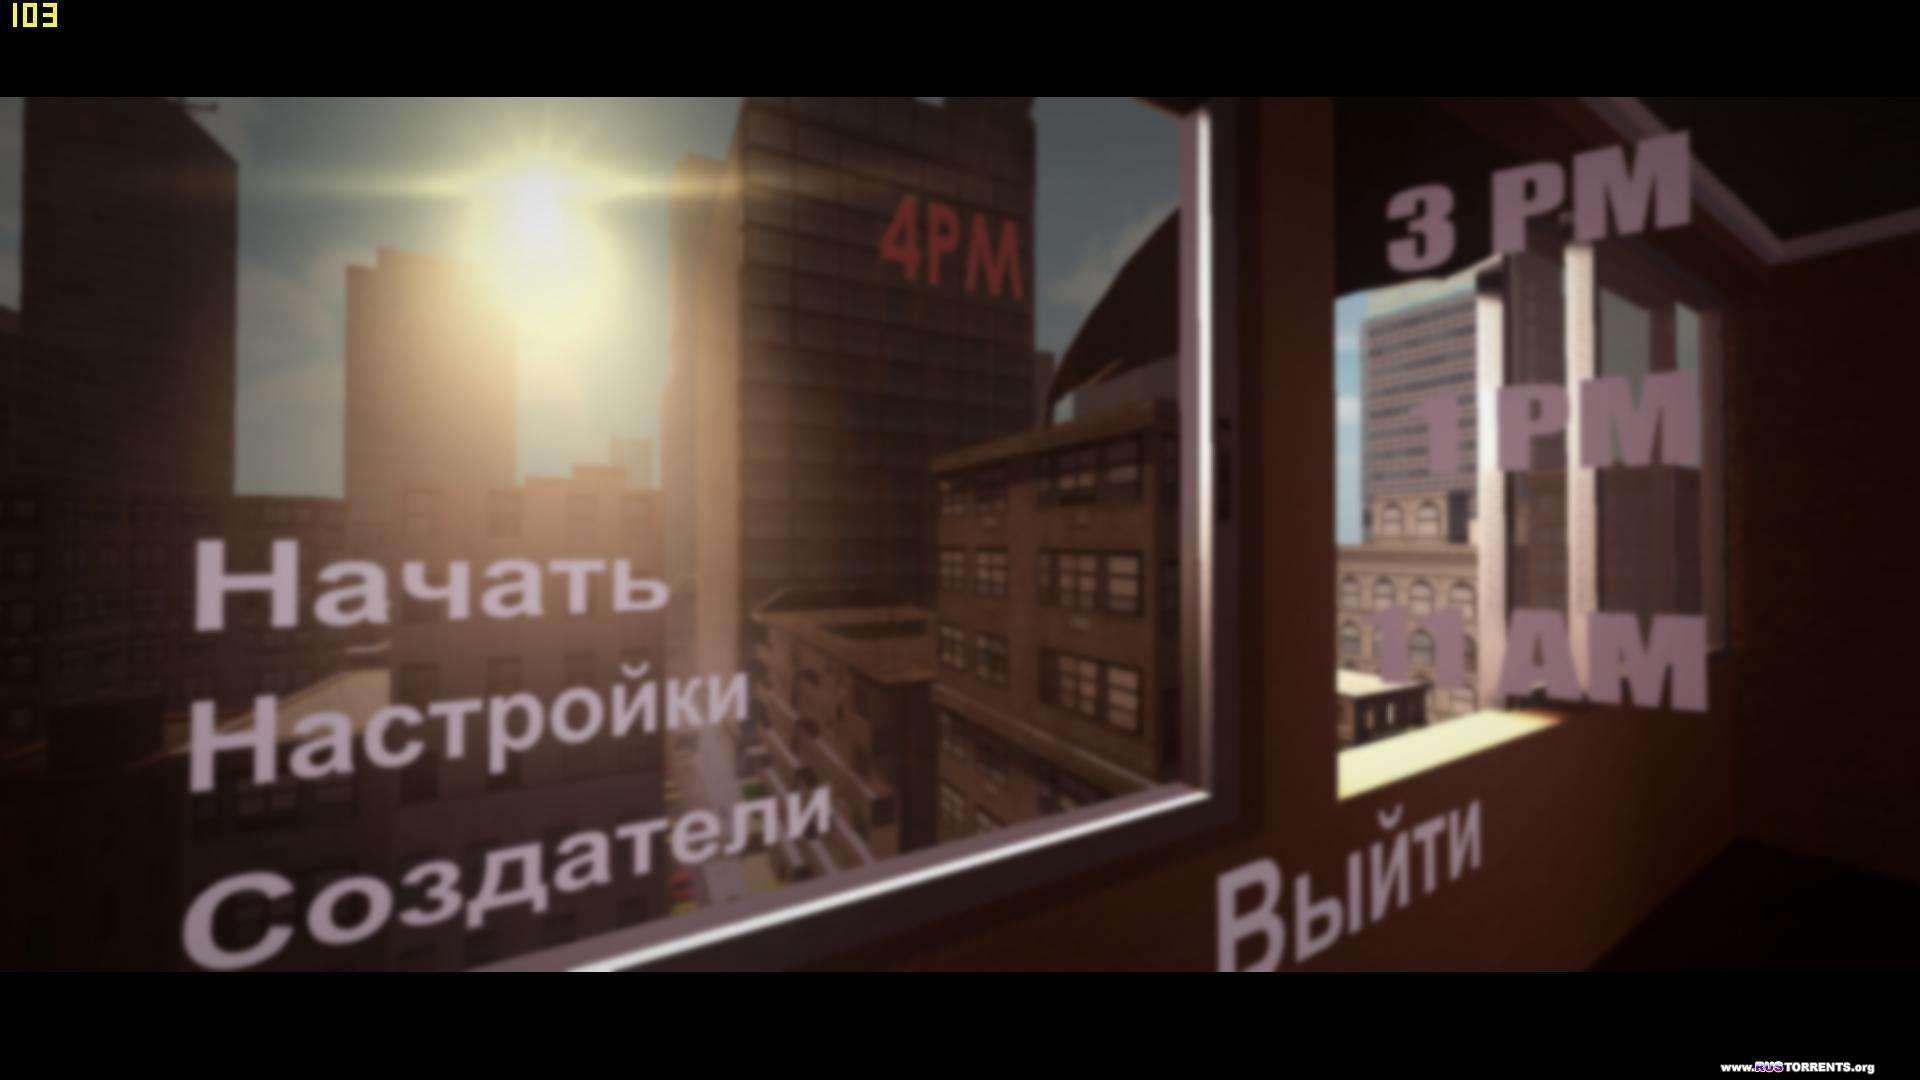 4PM | PC | RePack от R.G. Steamgames